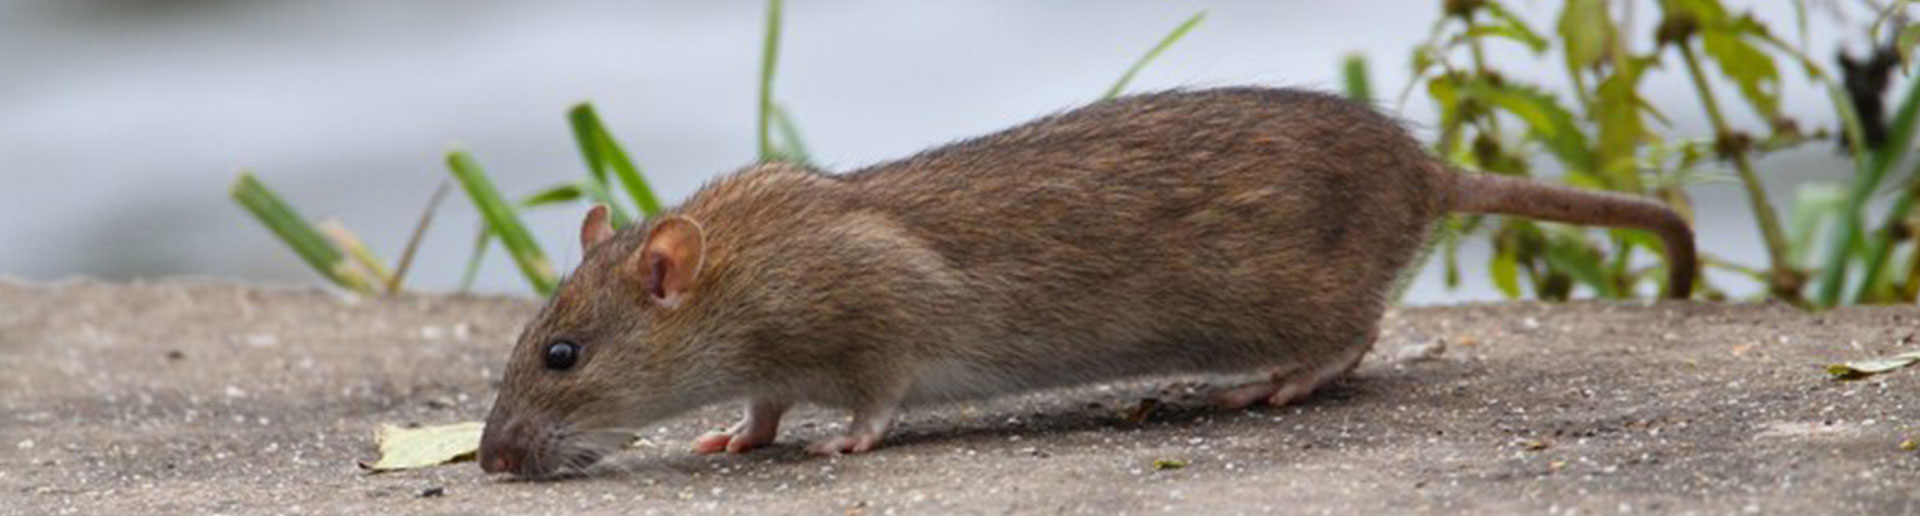 Ratten Im Garten Kammerjäger Ratgeber